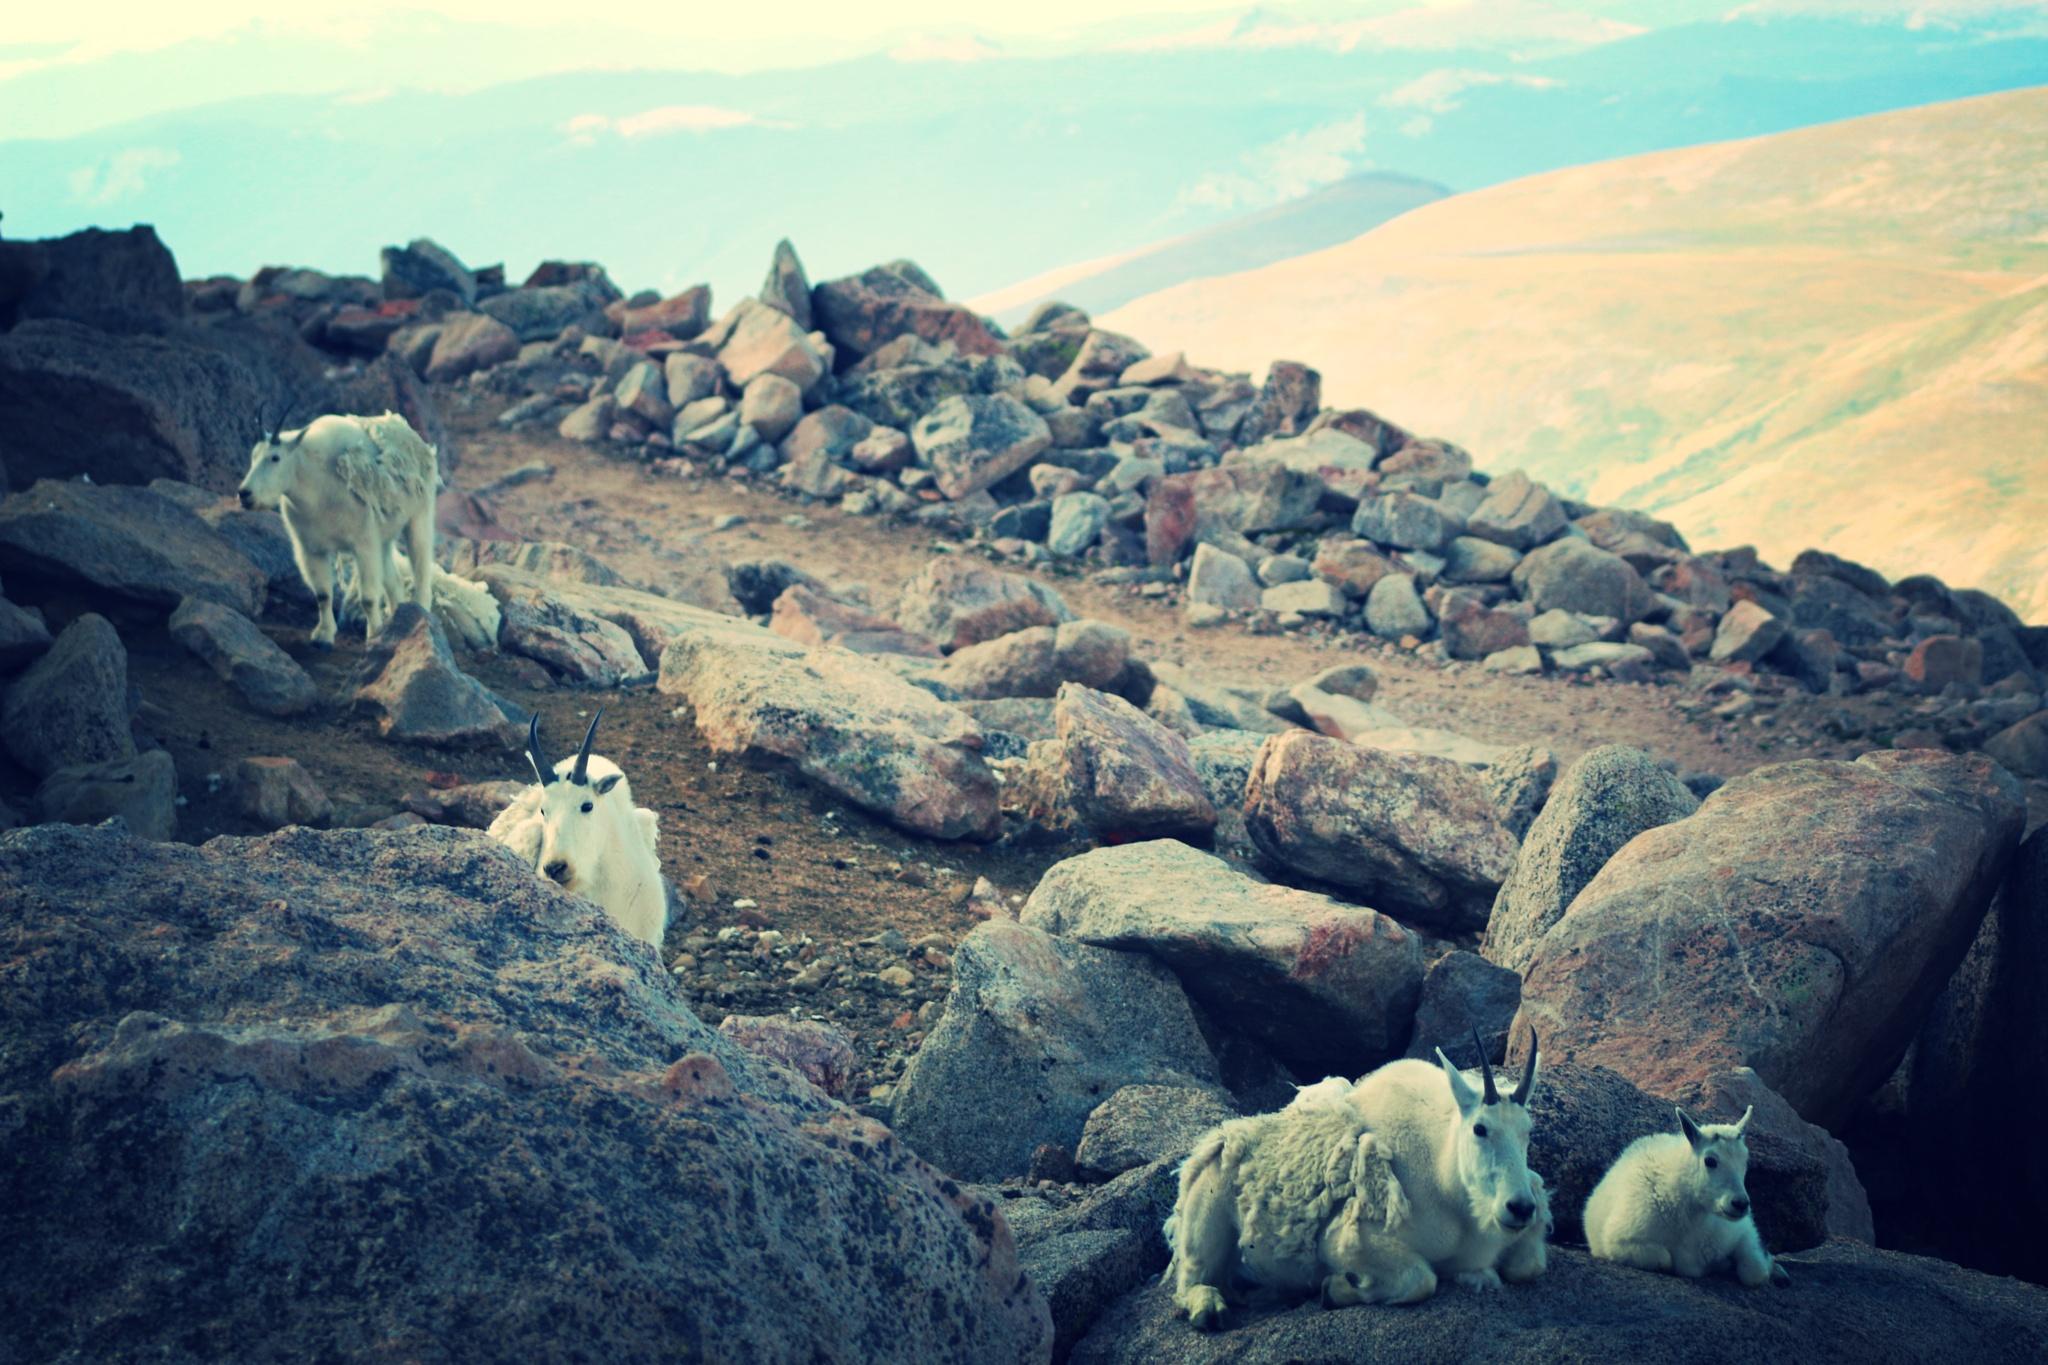 Life on the Rocks by Tina Shragal